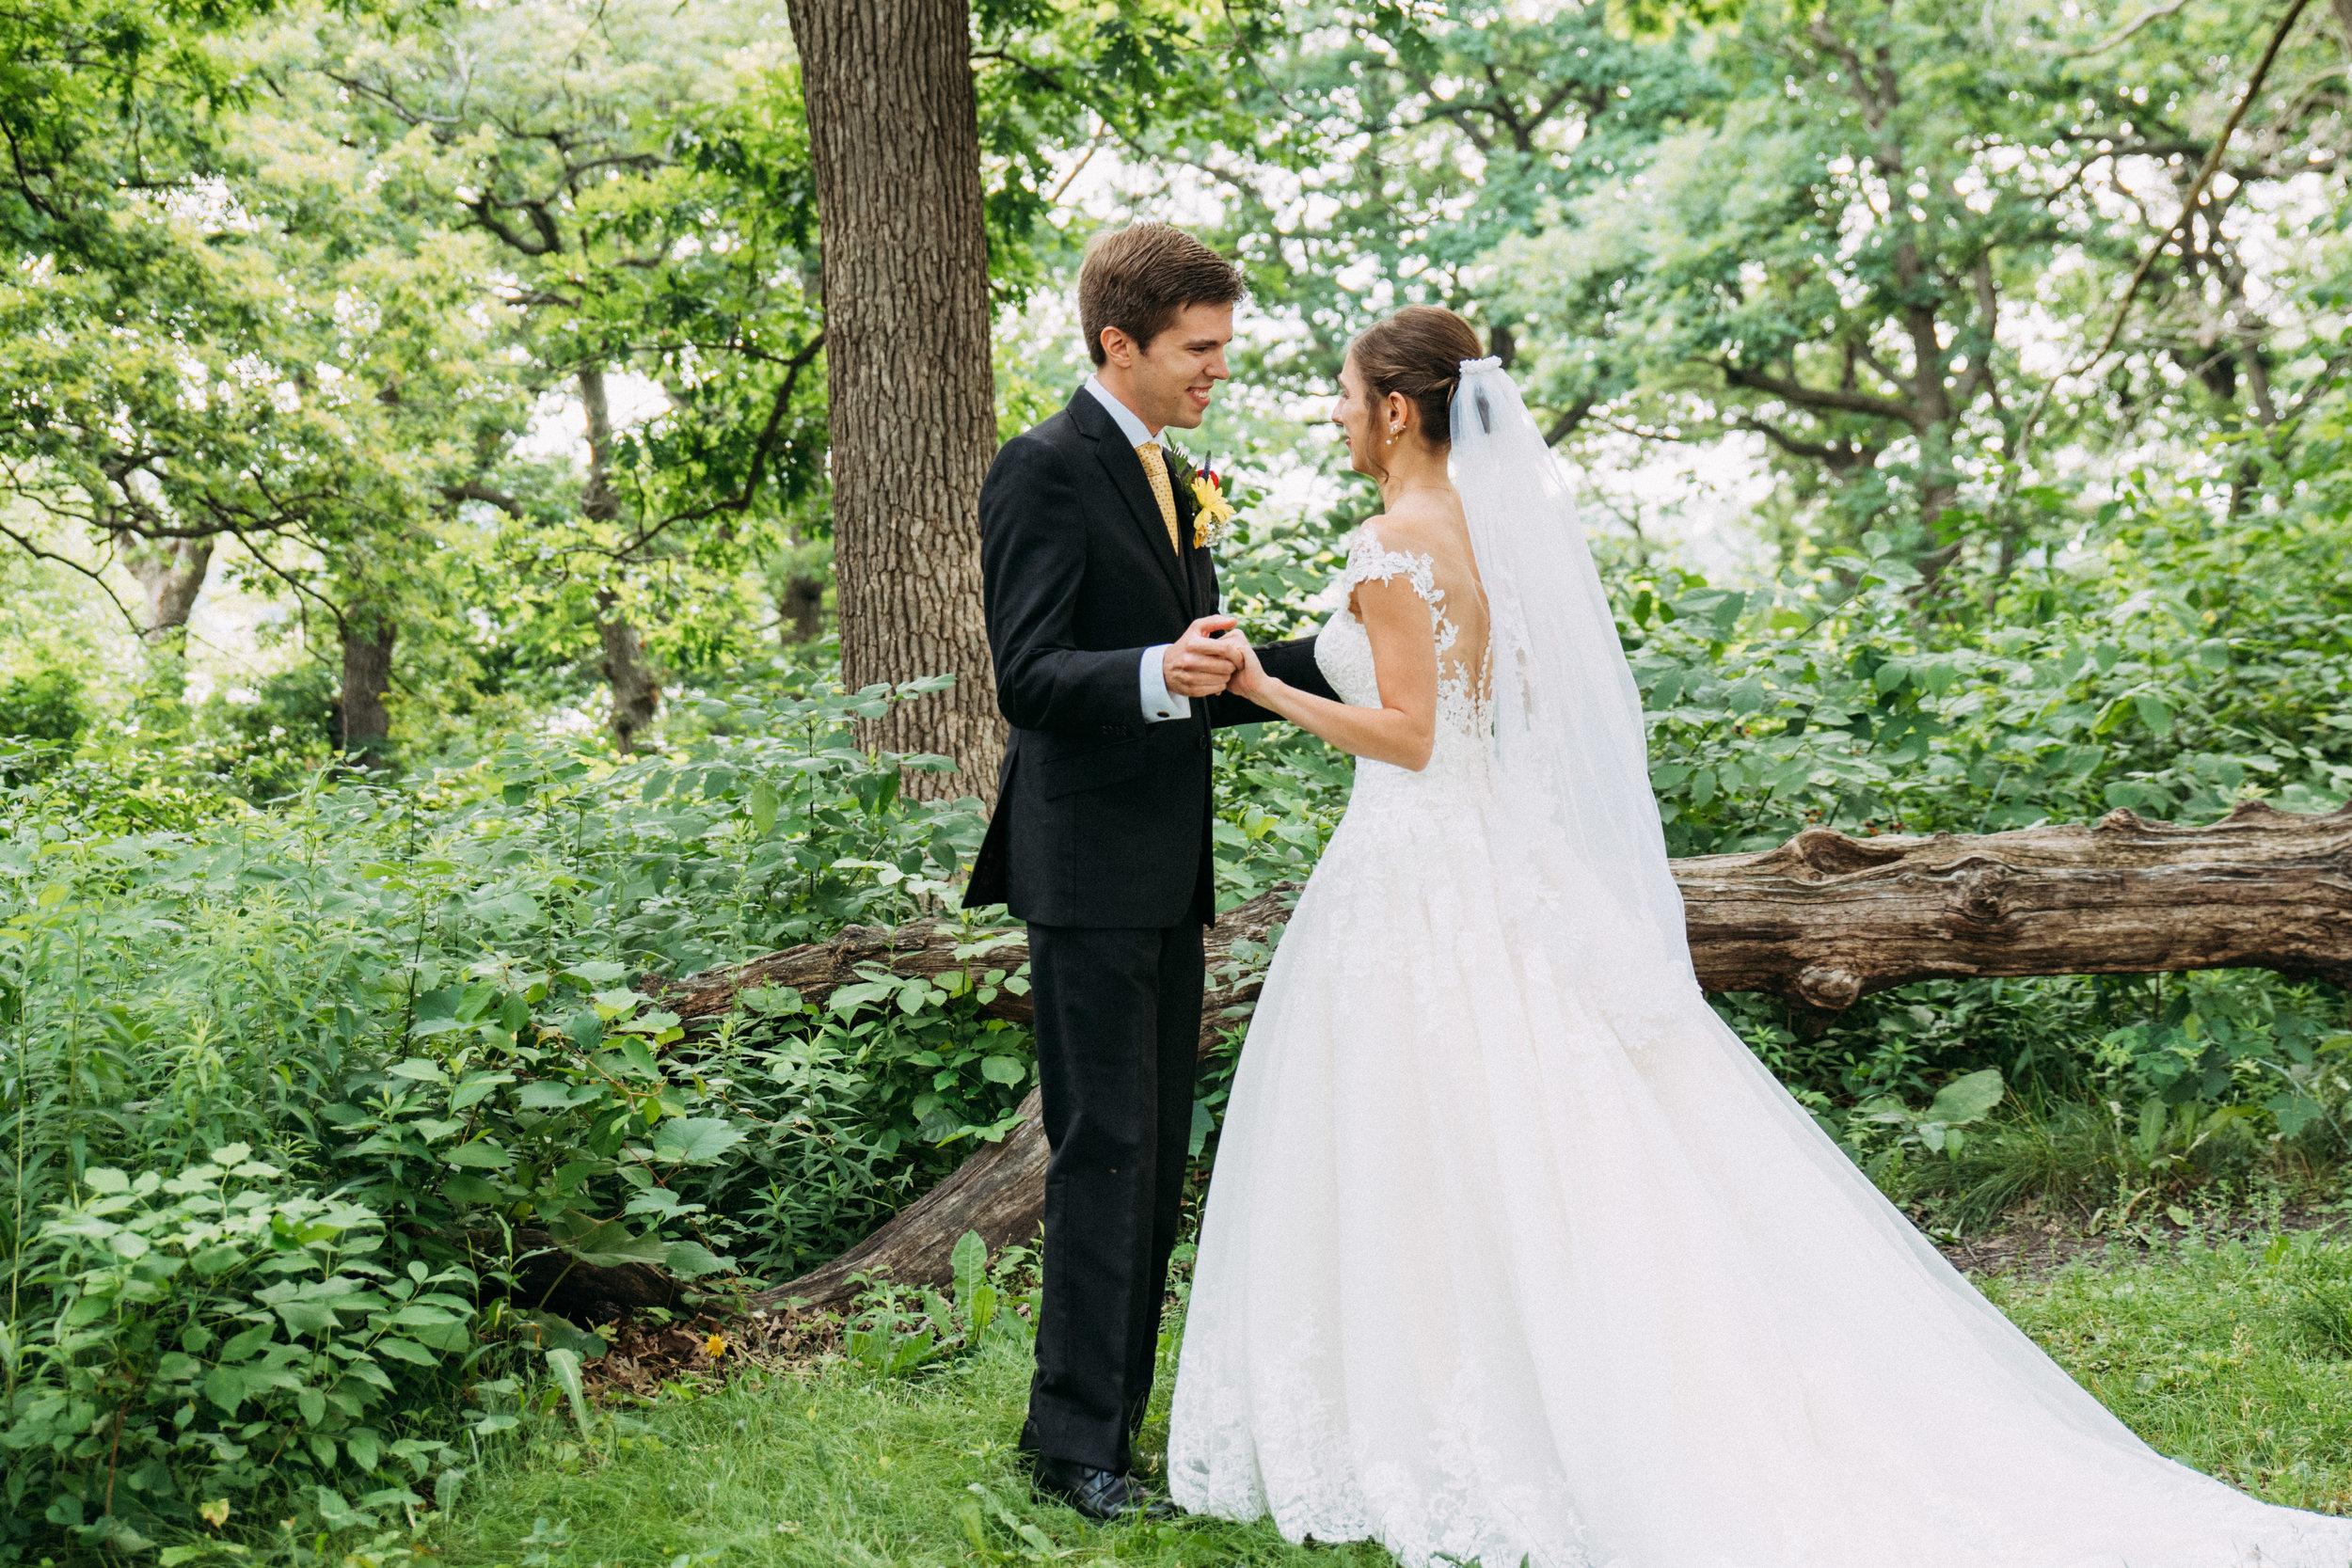 8-Liza_Chris_Minneapolis_Minnesota_Wedding.jpg